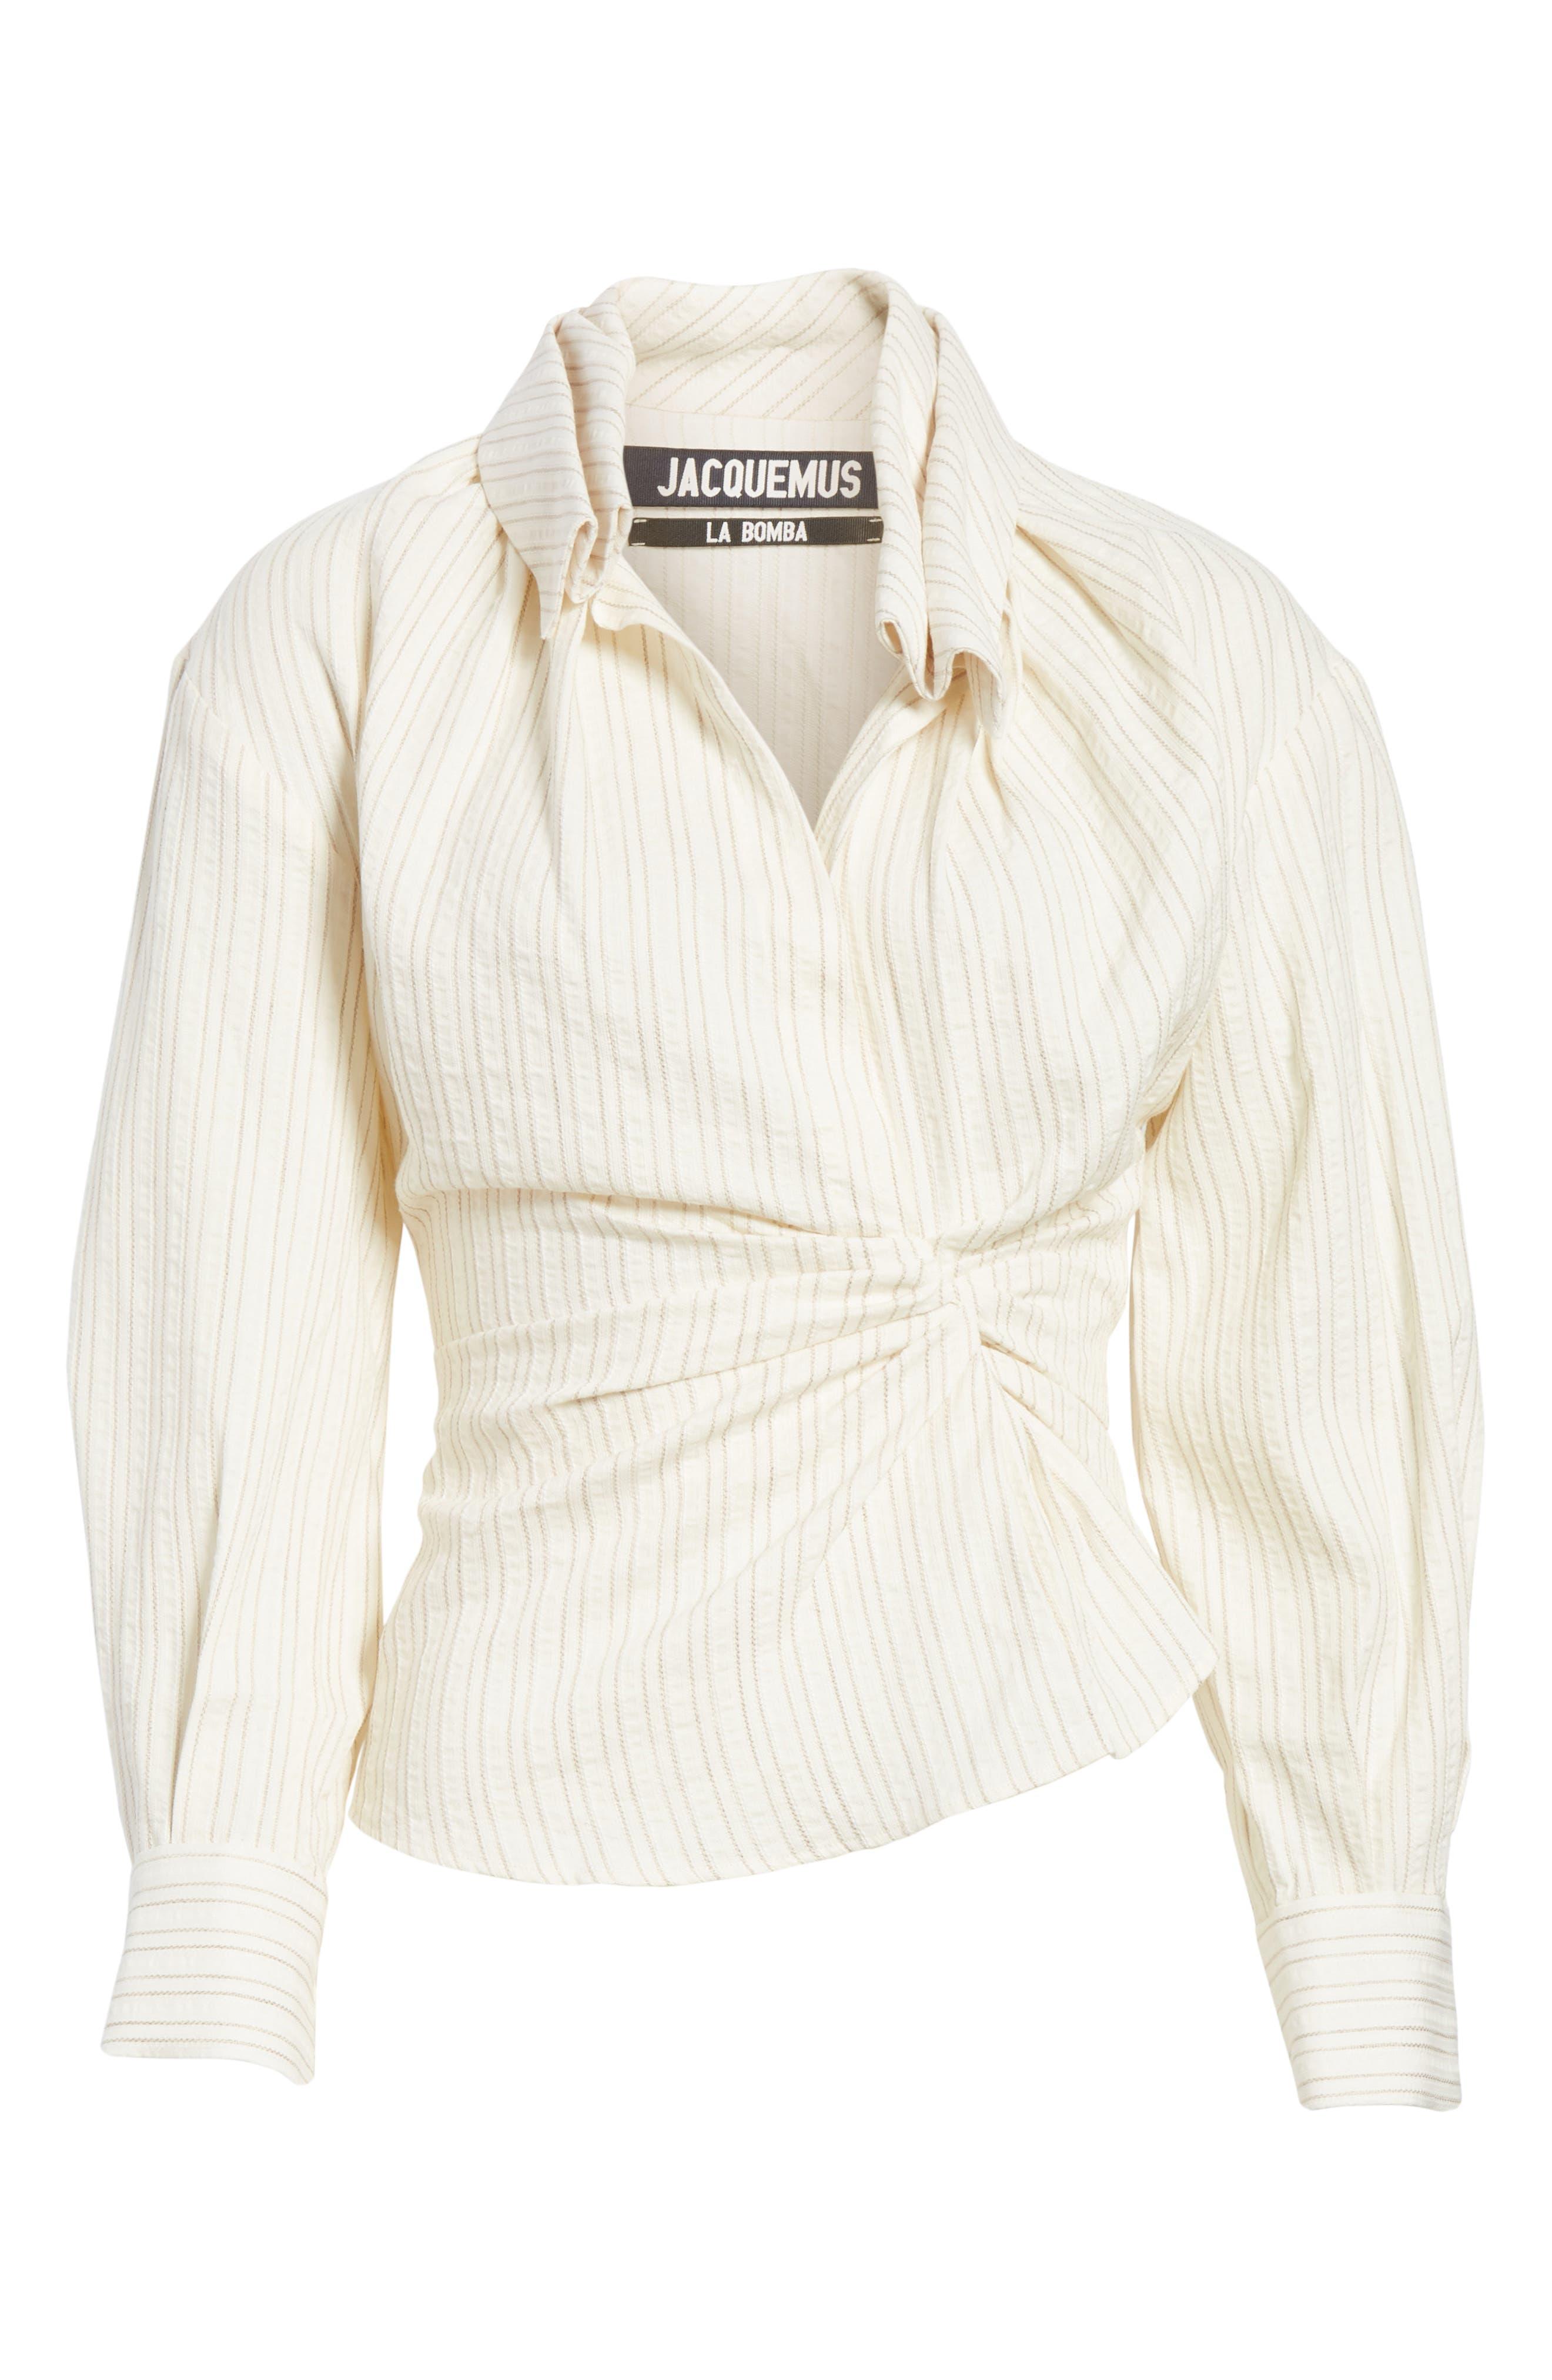 La Chemise Belem Shirt,                             Alternate thumbnail 6, color,                             250